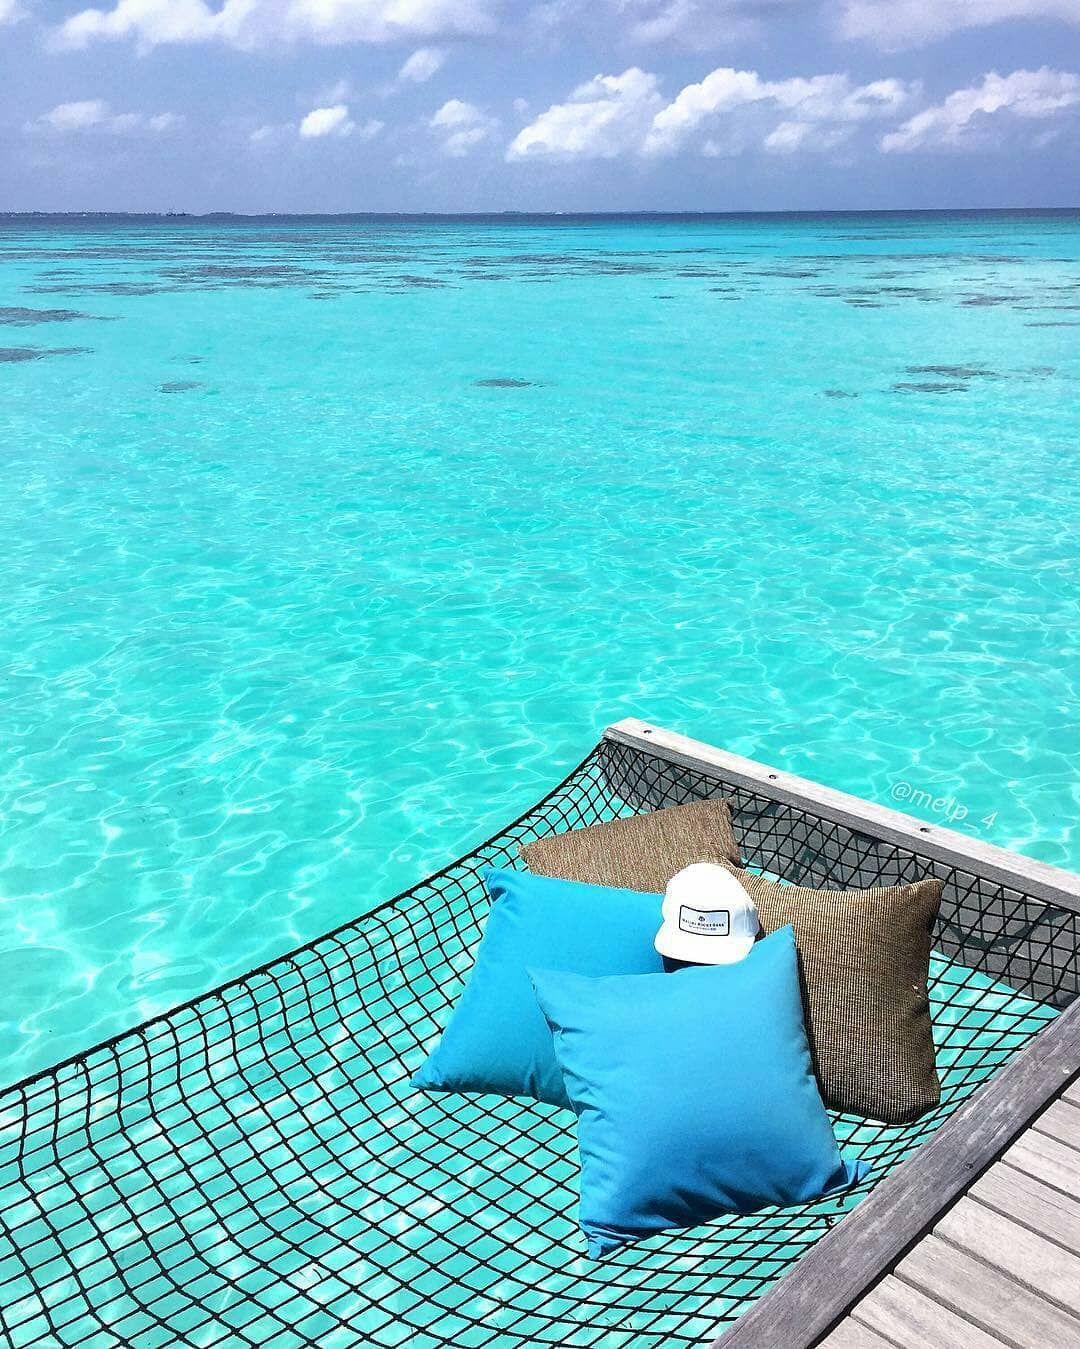 Maldives Beach: Shangri-La's Villingili Resort & Spa #Maldives